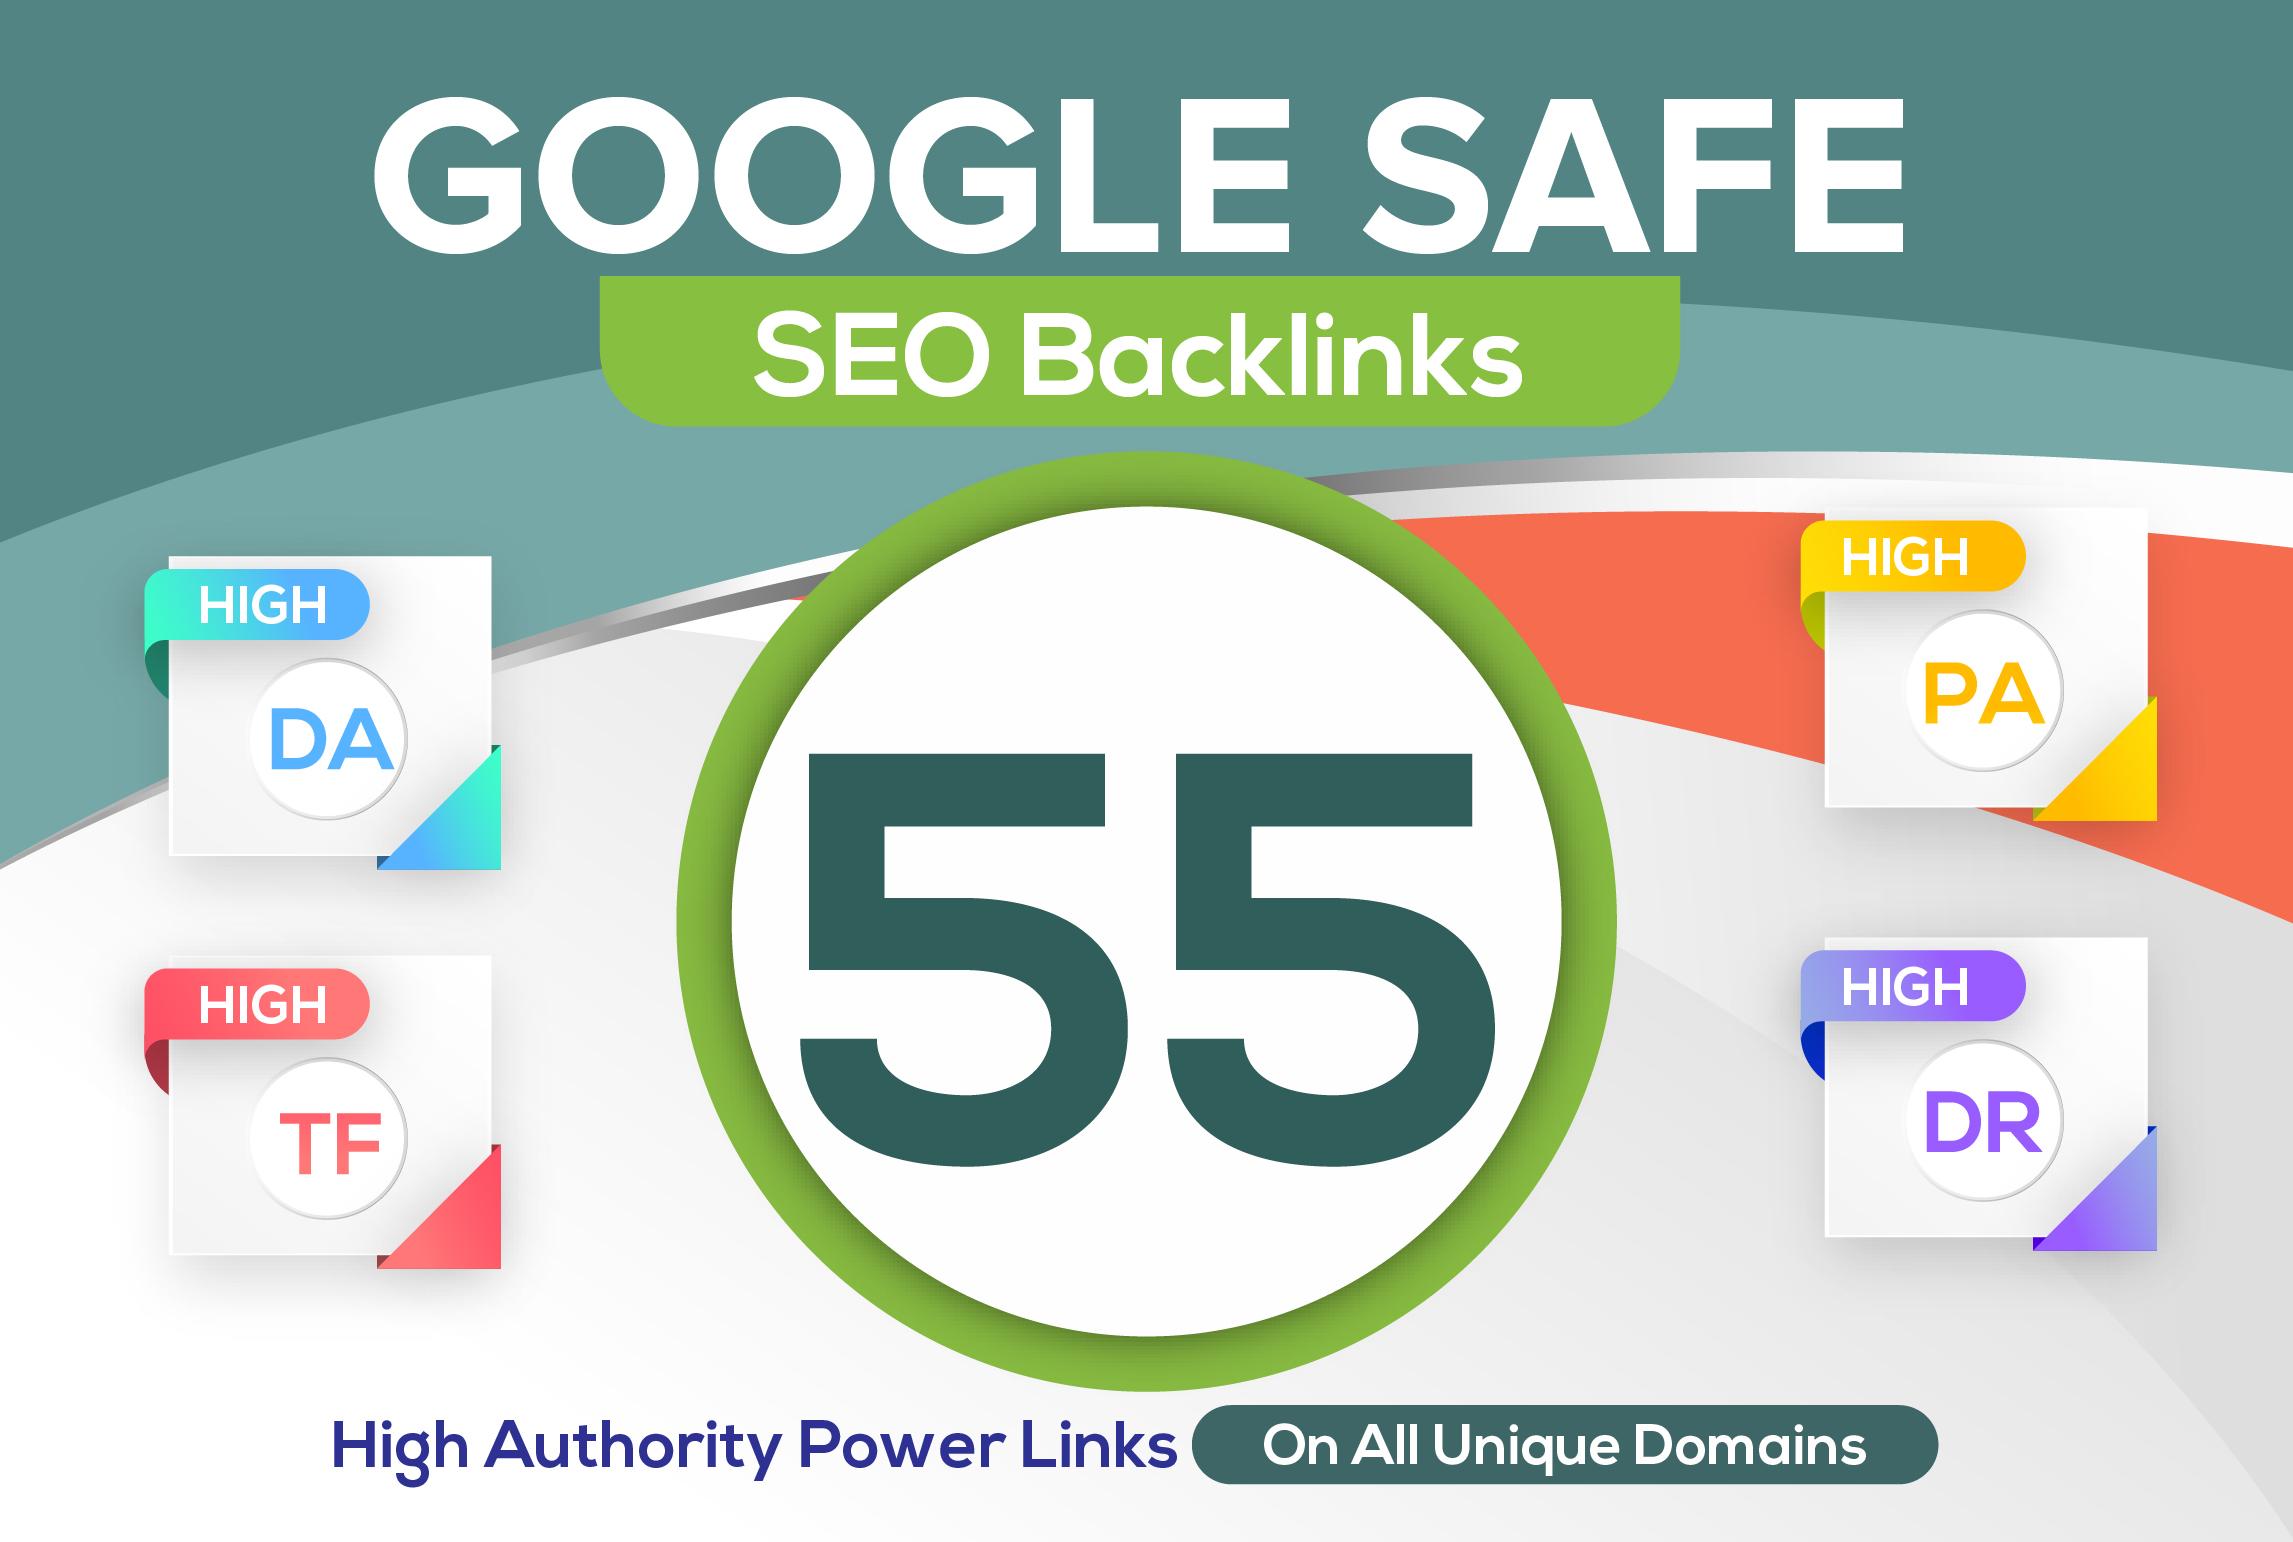 build 55 unique domain SEO backlinks on tf100 da100 sites